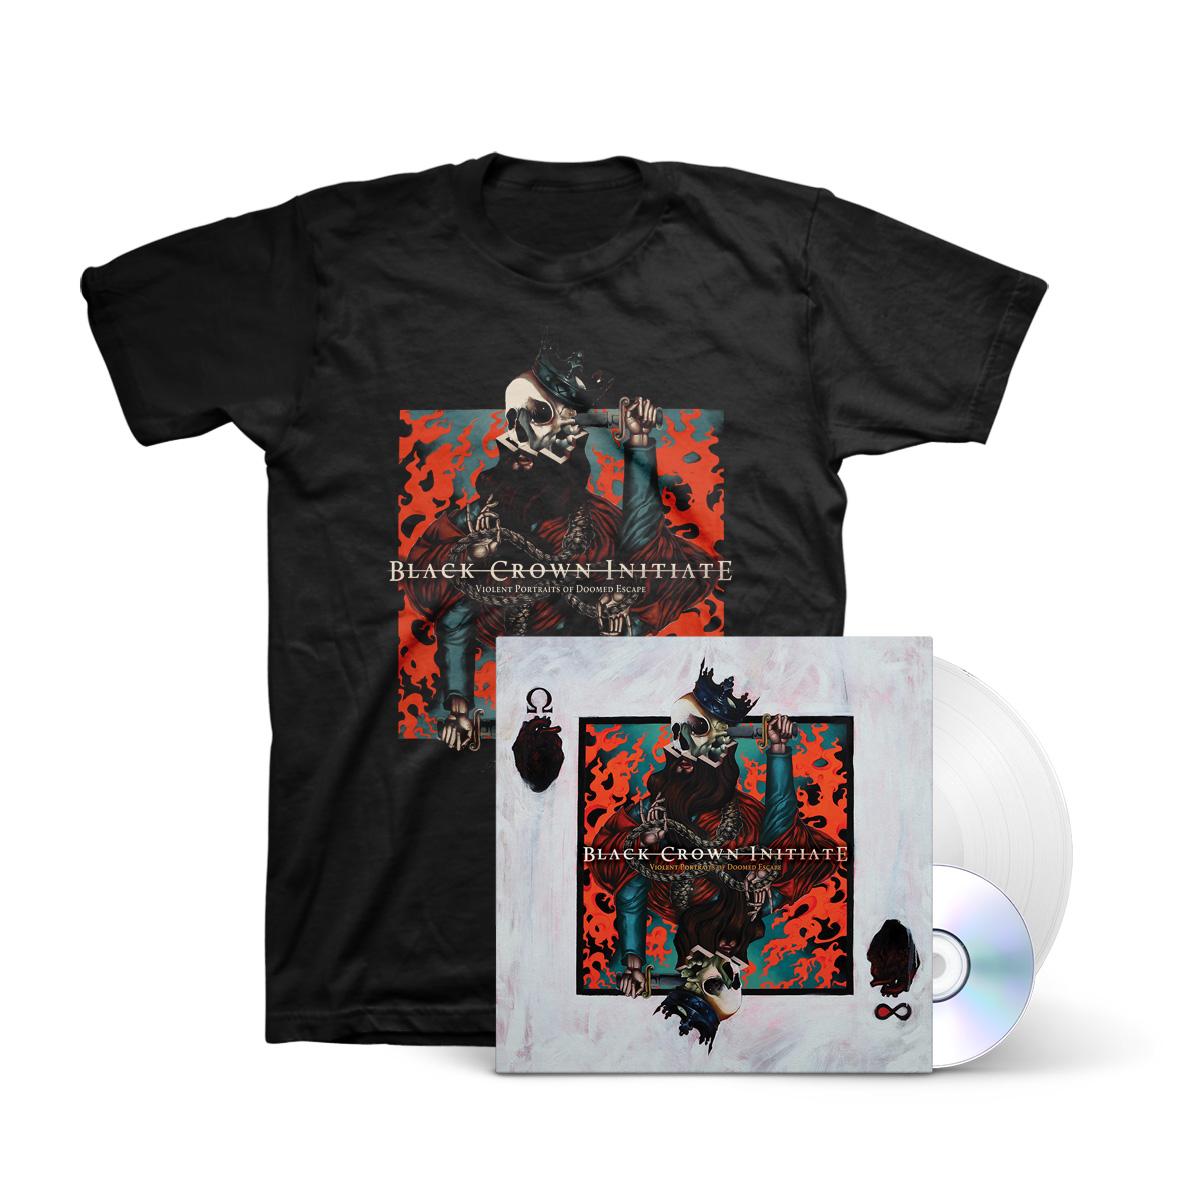 Black Crown Initiate - Violent Portraits of Doomed Escape White LP + CD + Black T-Shirt + Digital Download